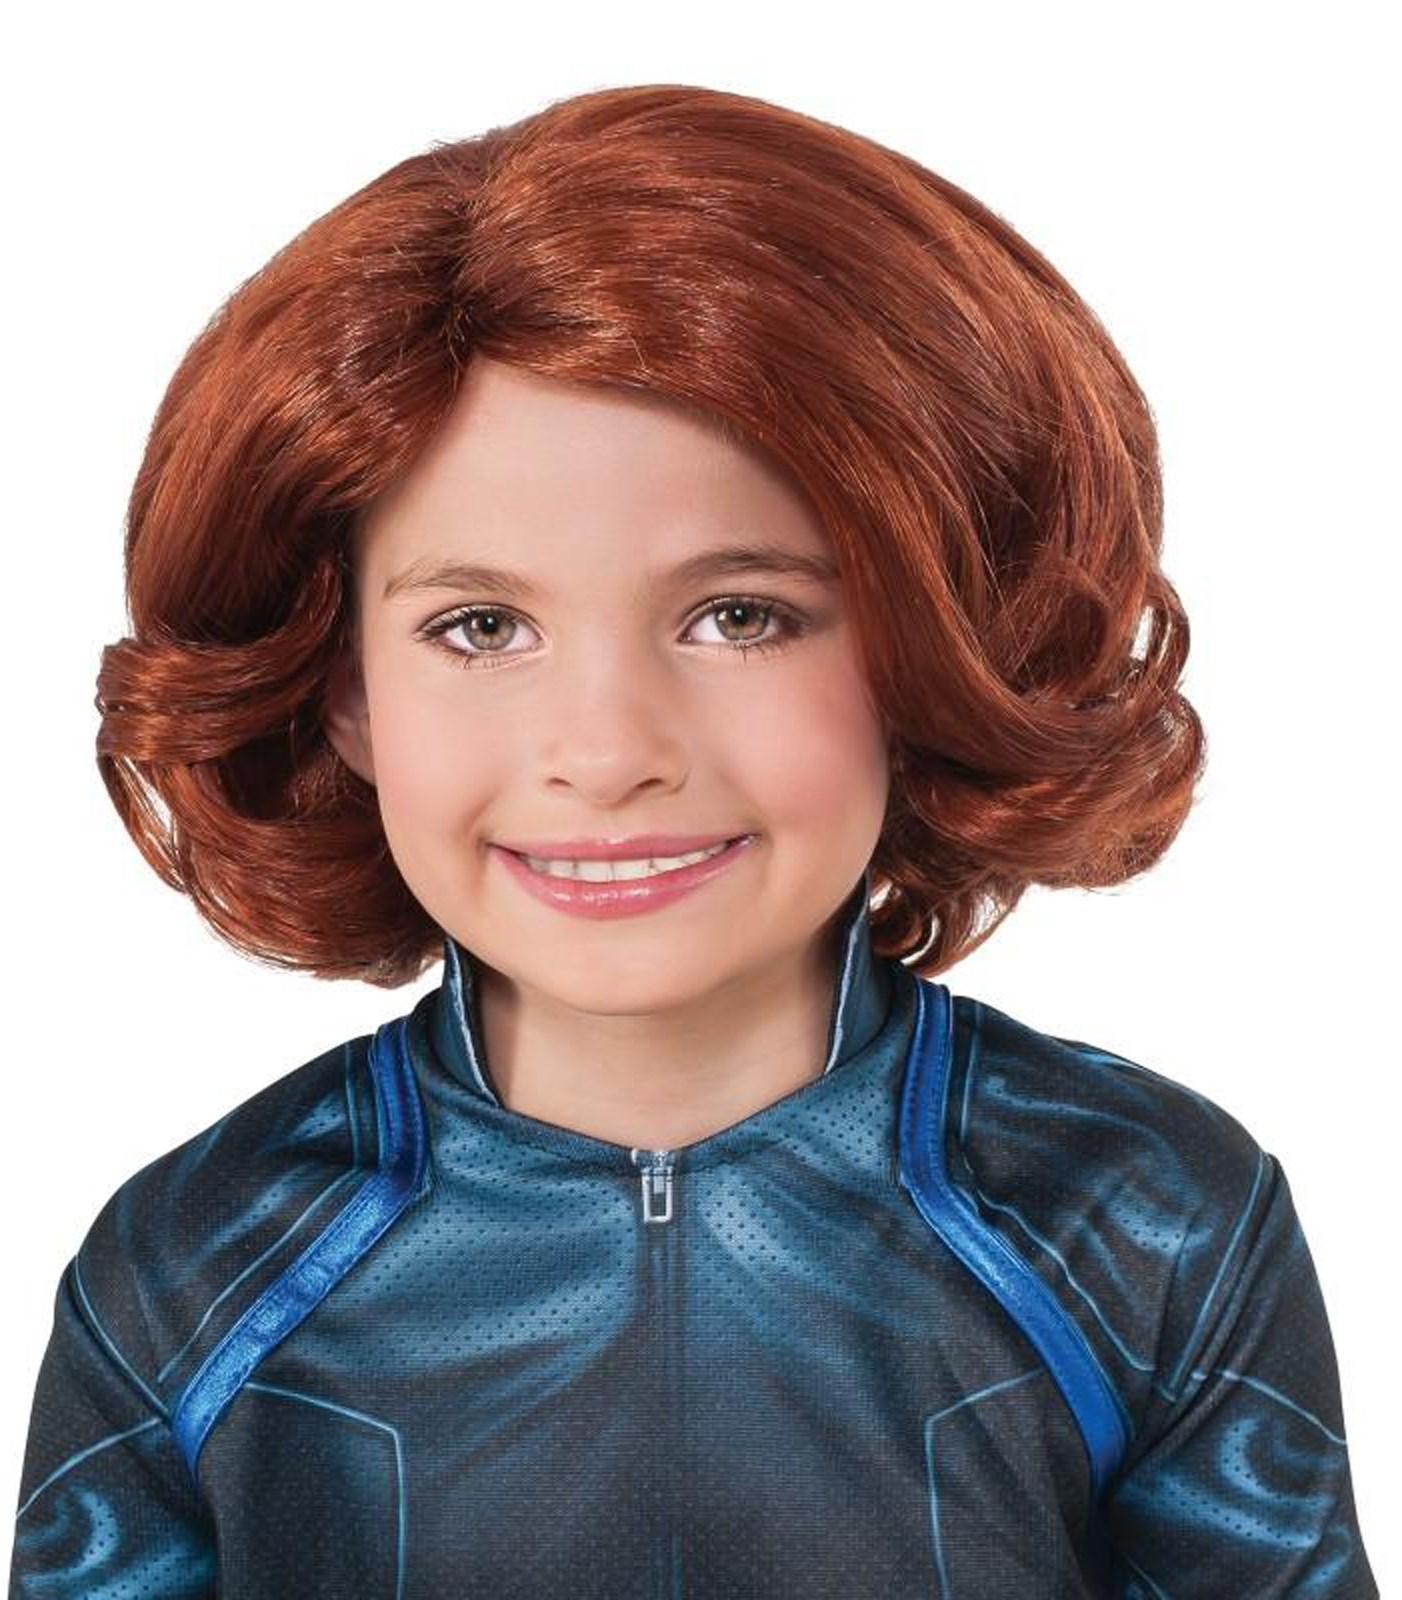 Avengers 2 - Age of Ultron: Black Widow Kids Wig